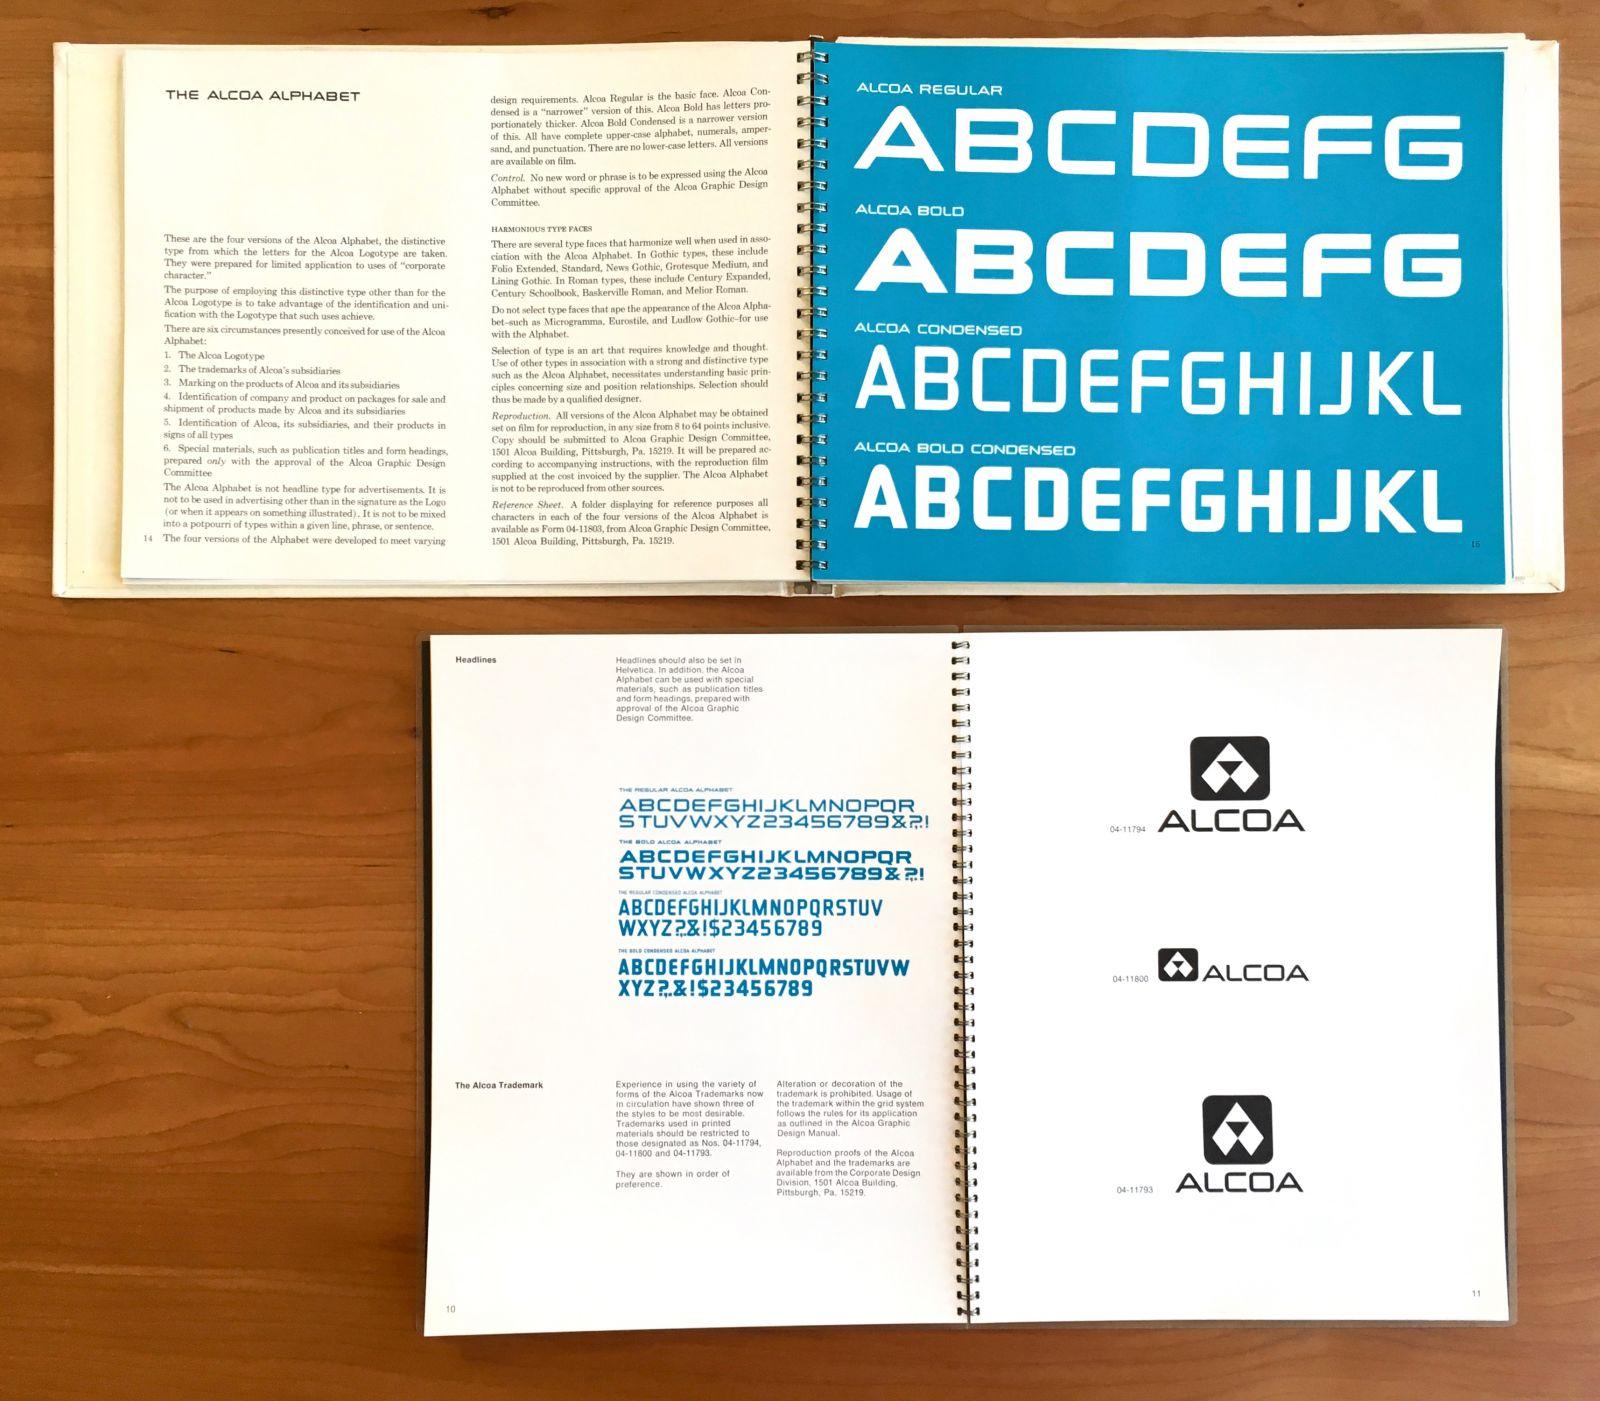 The Alcoa Alphabet